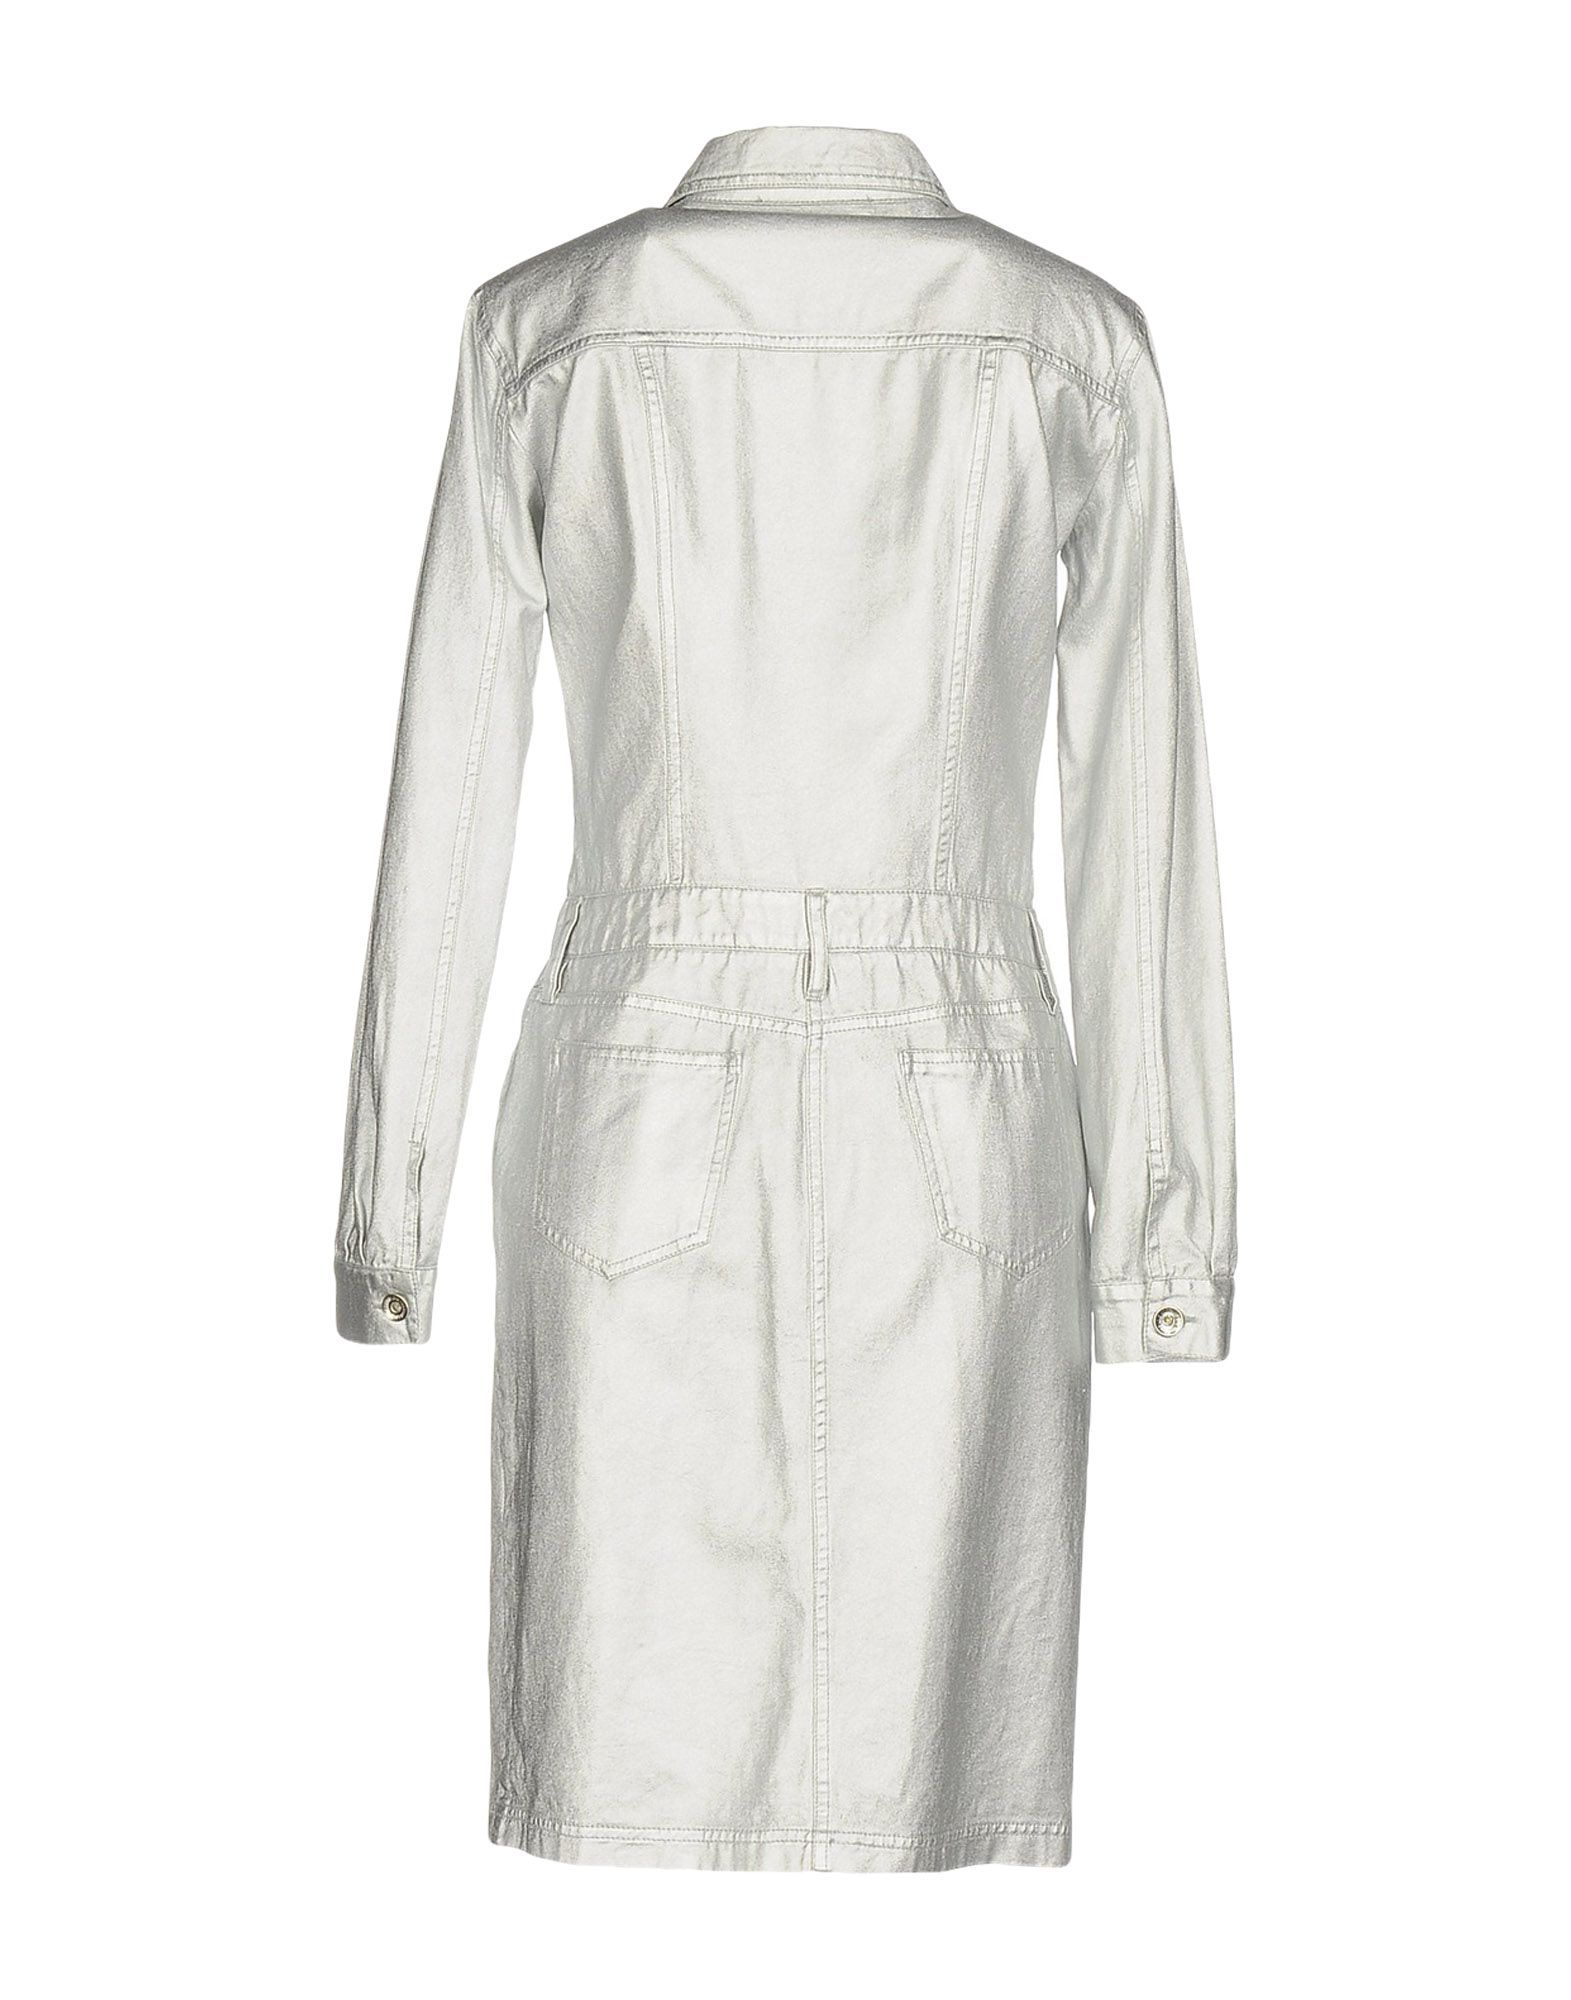 Love Moschino Silver Denim Shirt Style Dress